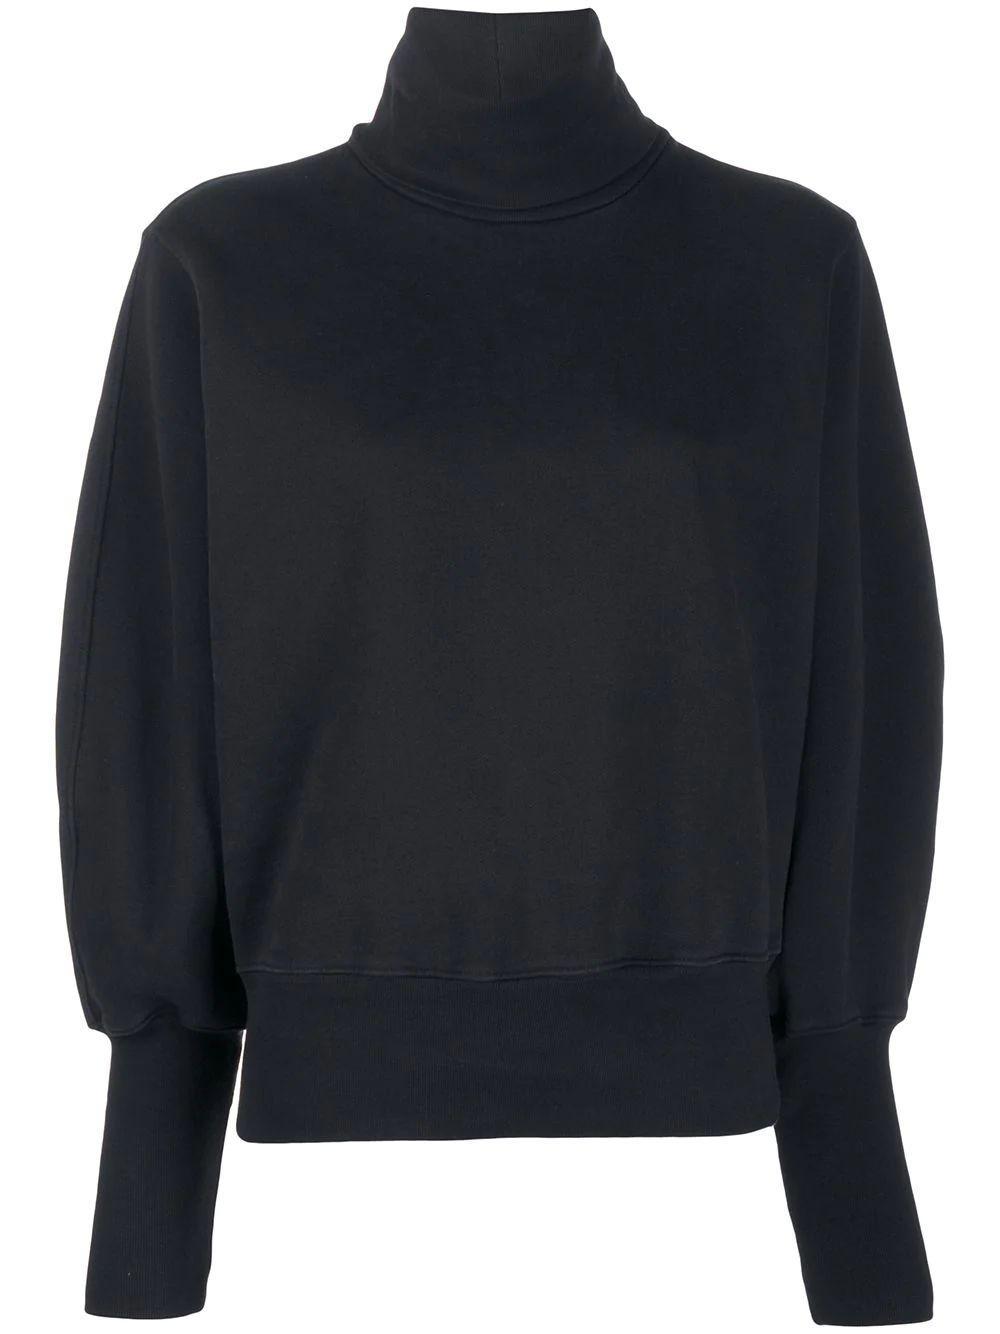 Extended Rib Turtleneck Sweatshirt Item # A7068